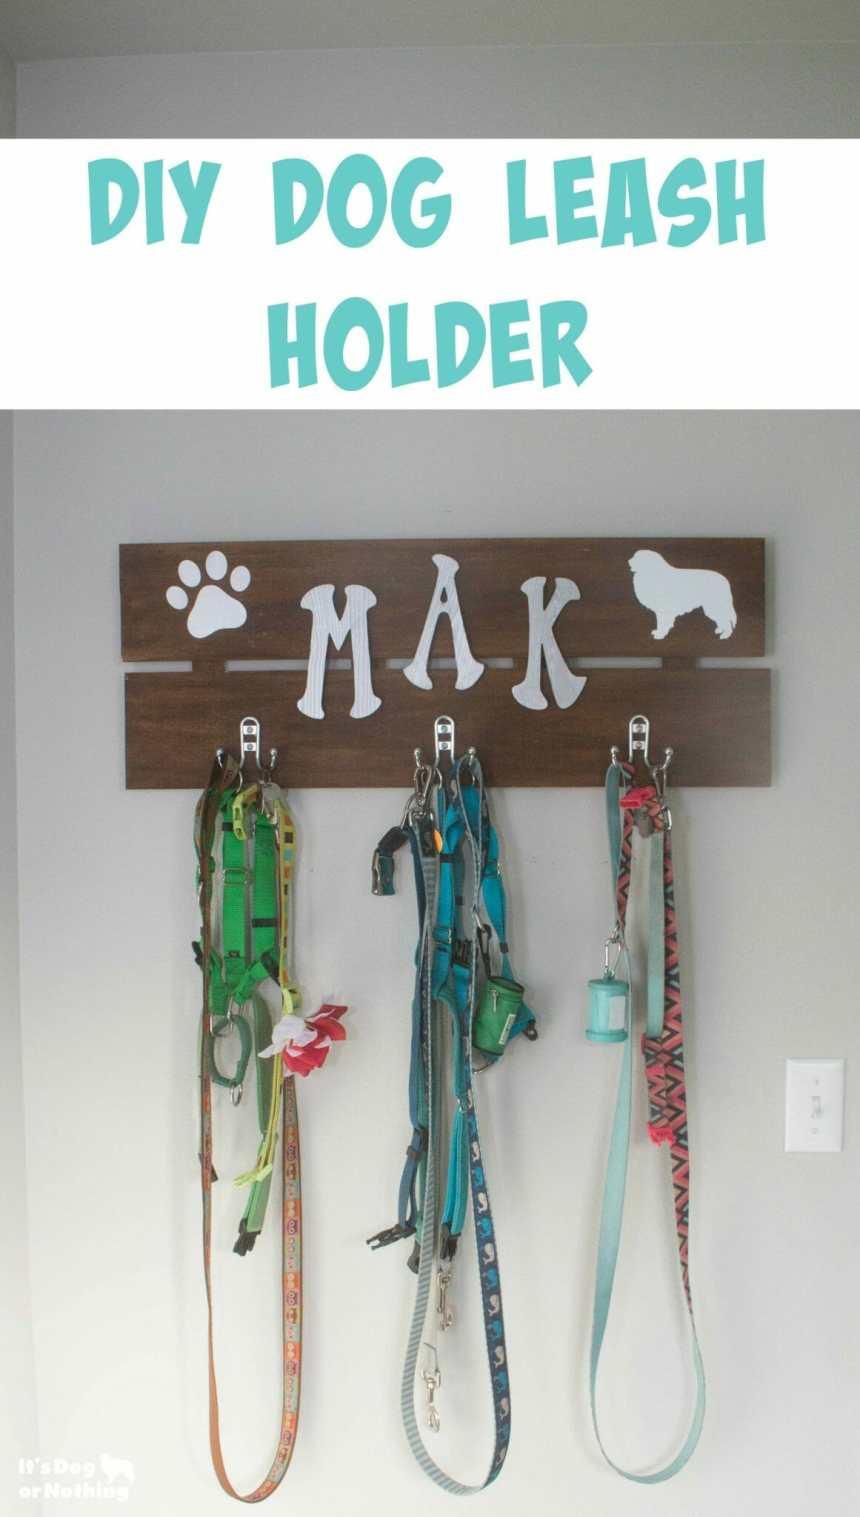 DIY Dog Leash Holder